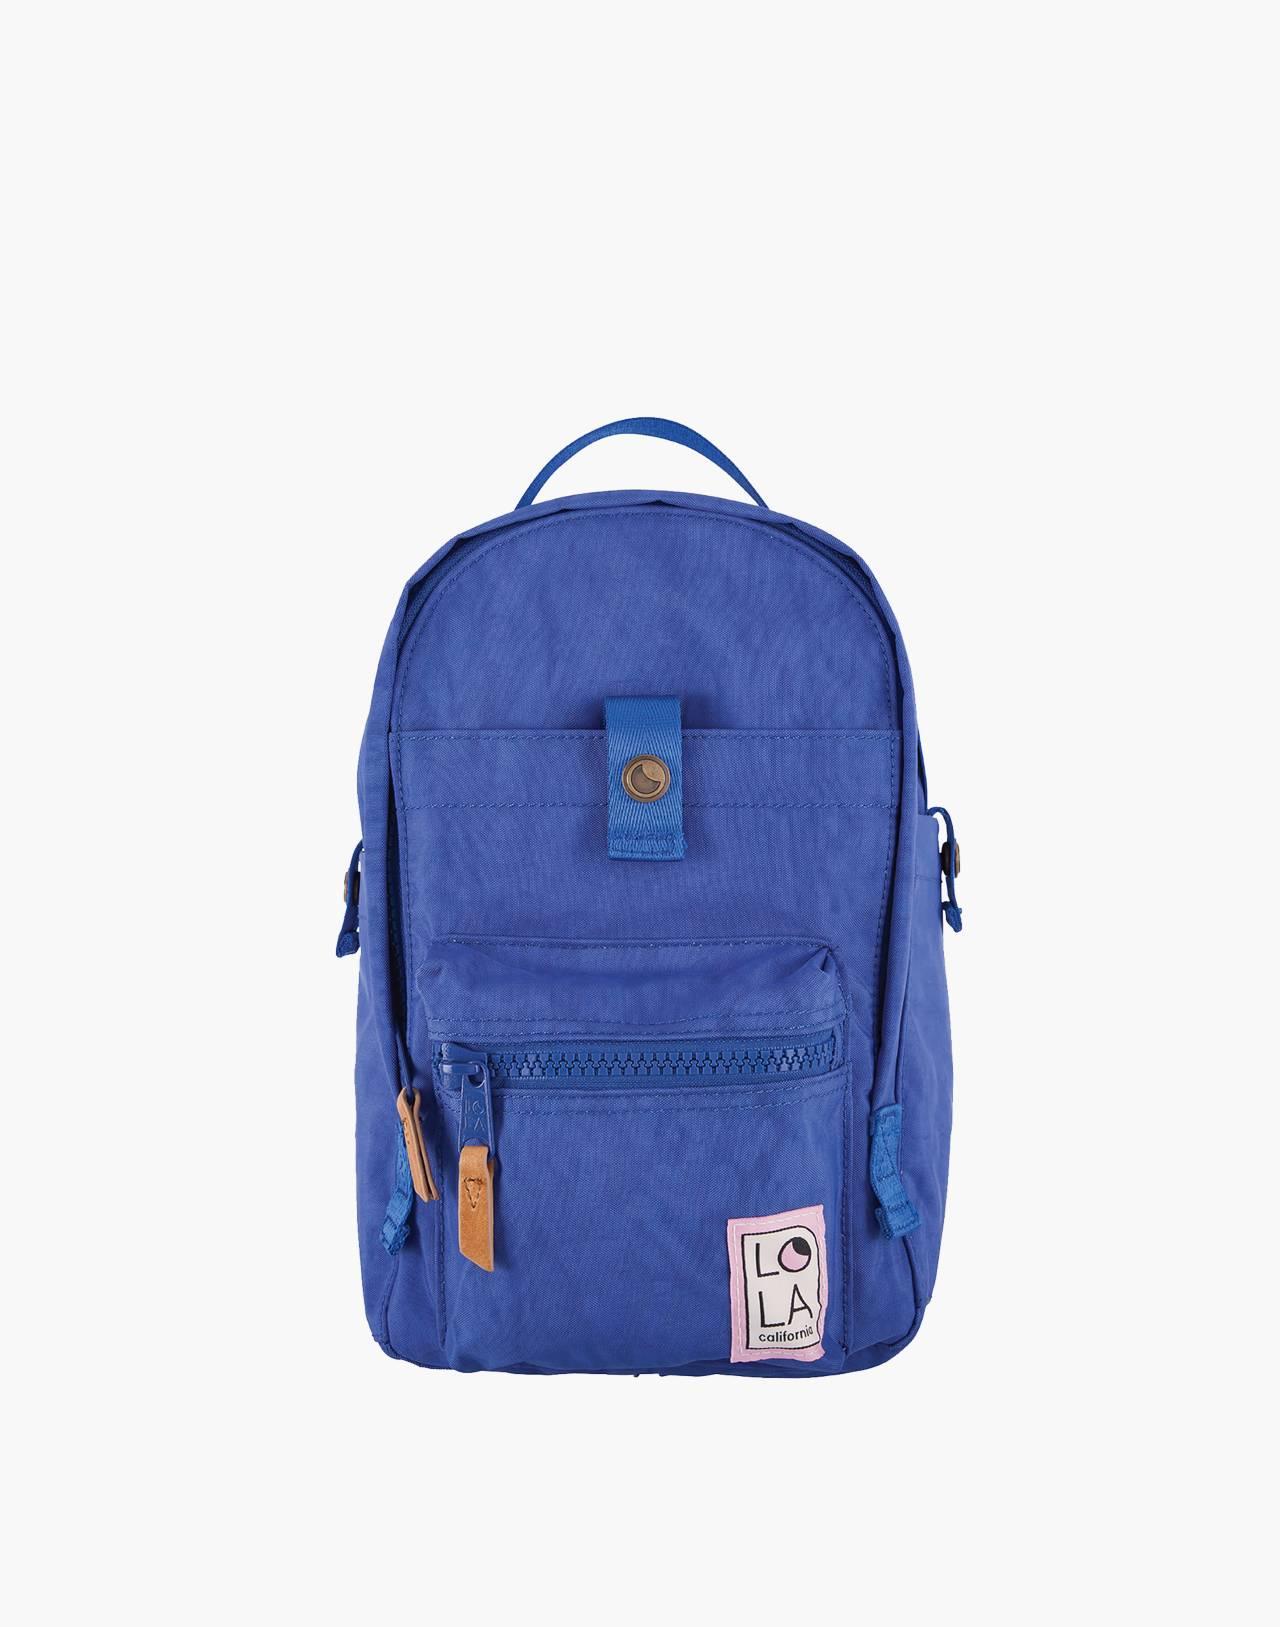 LOLA™ Mondo Utopian Small Backpack in blue image 1